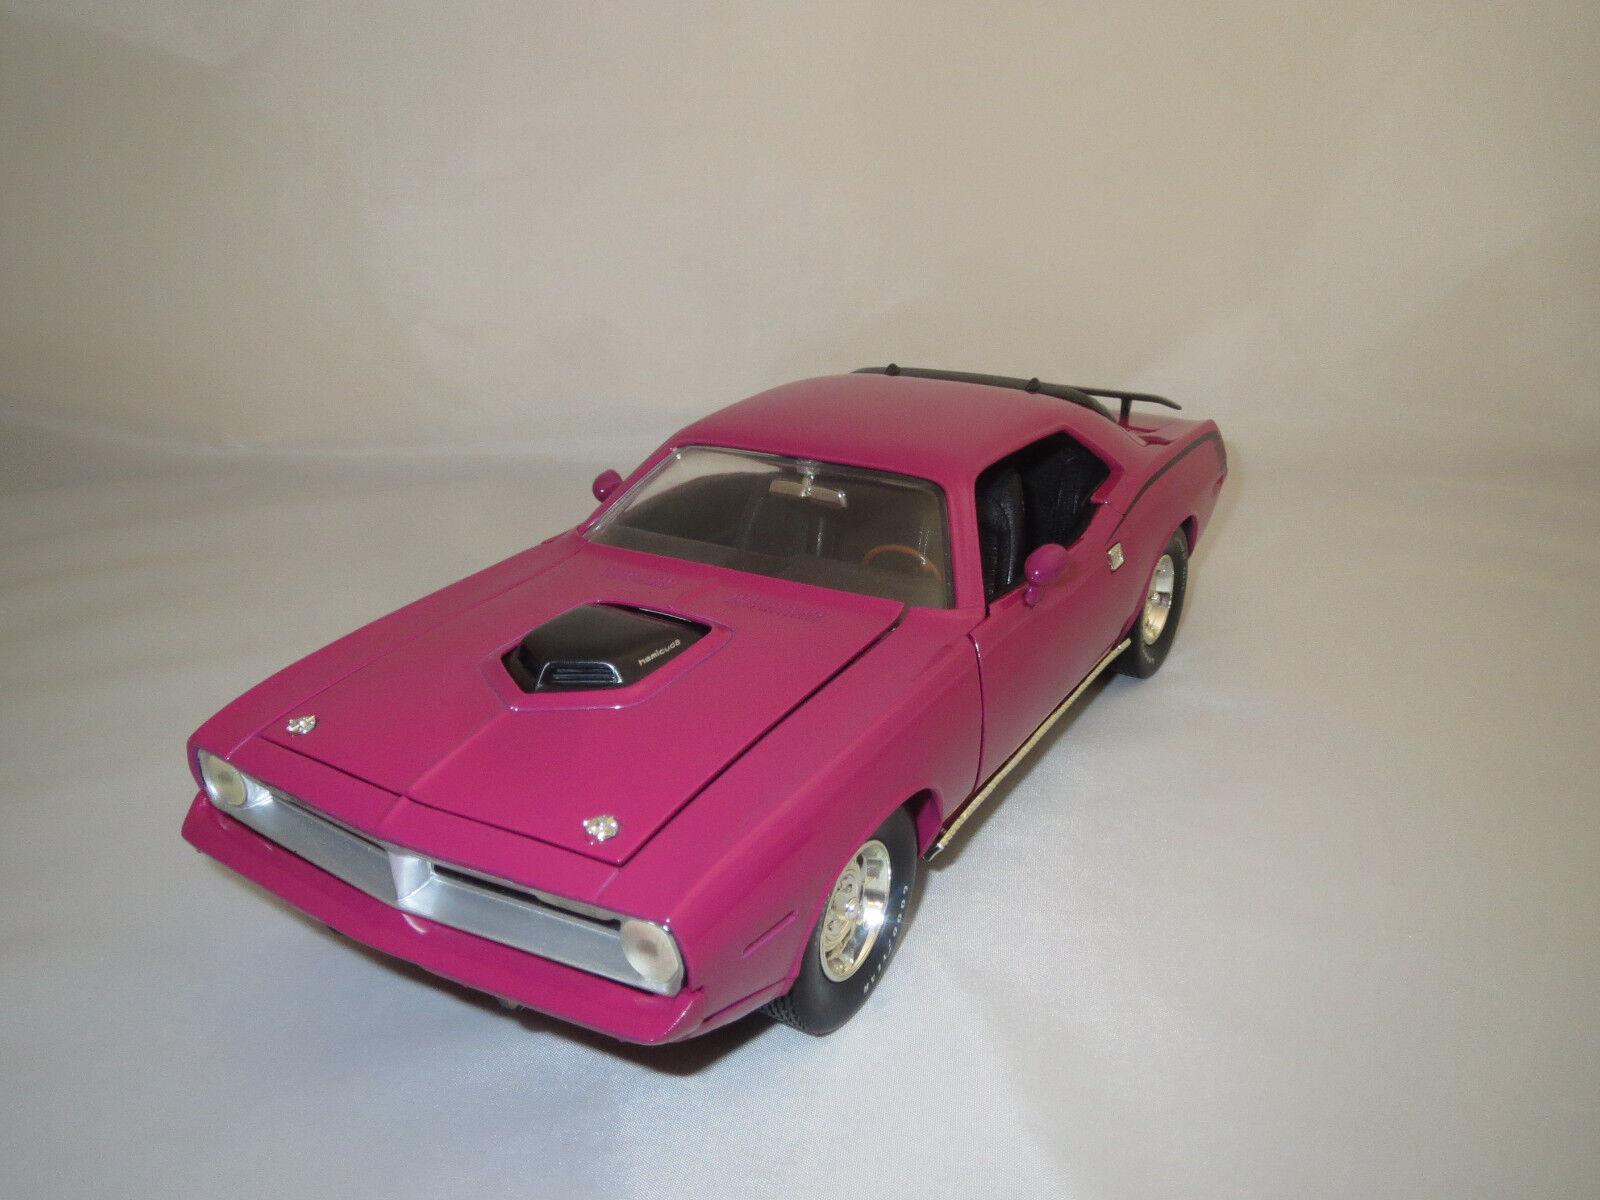 ERTL American Muscle Plymouth HEMI Cuda  1970  (rosado) 1 18 senza imballaggio